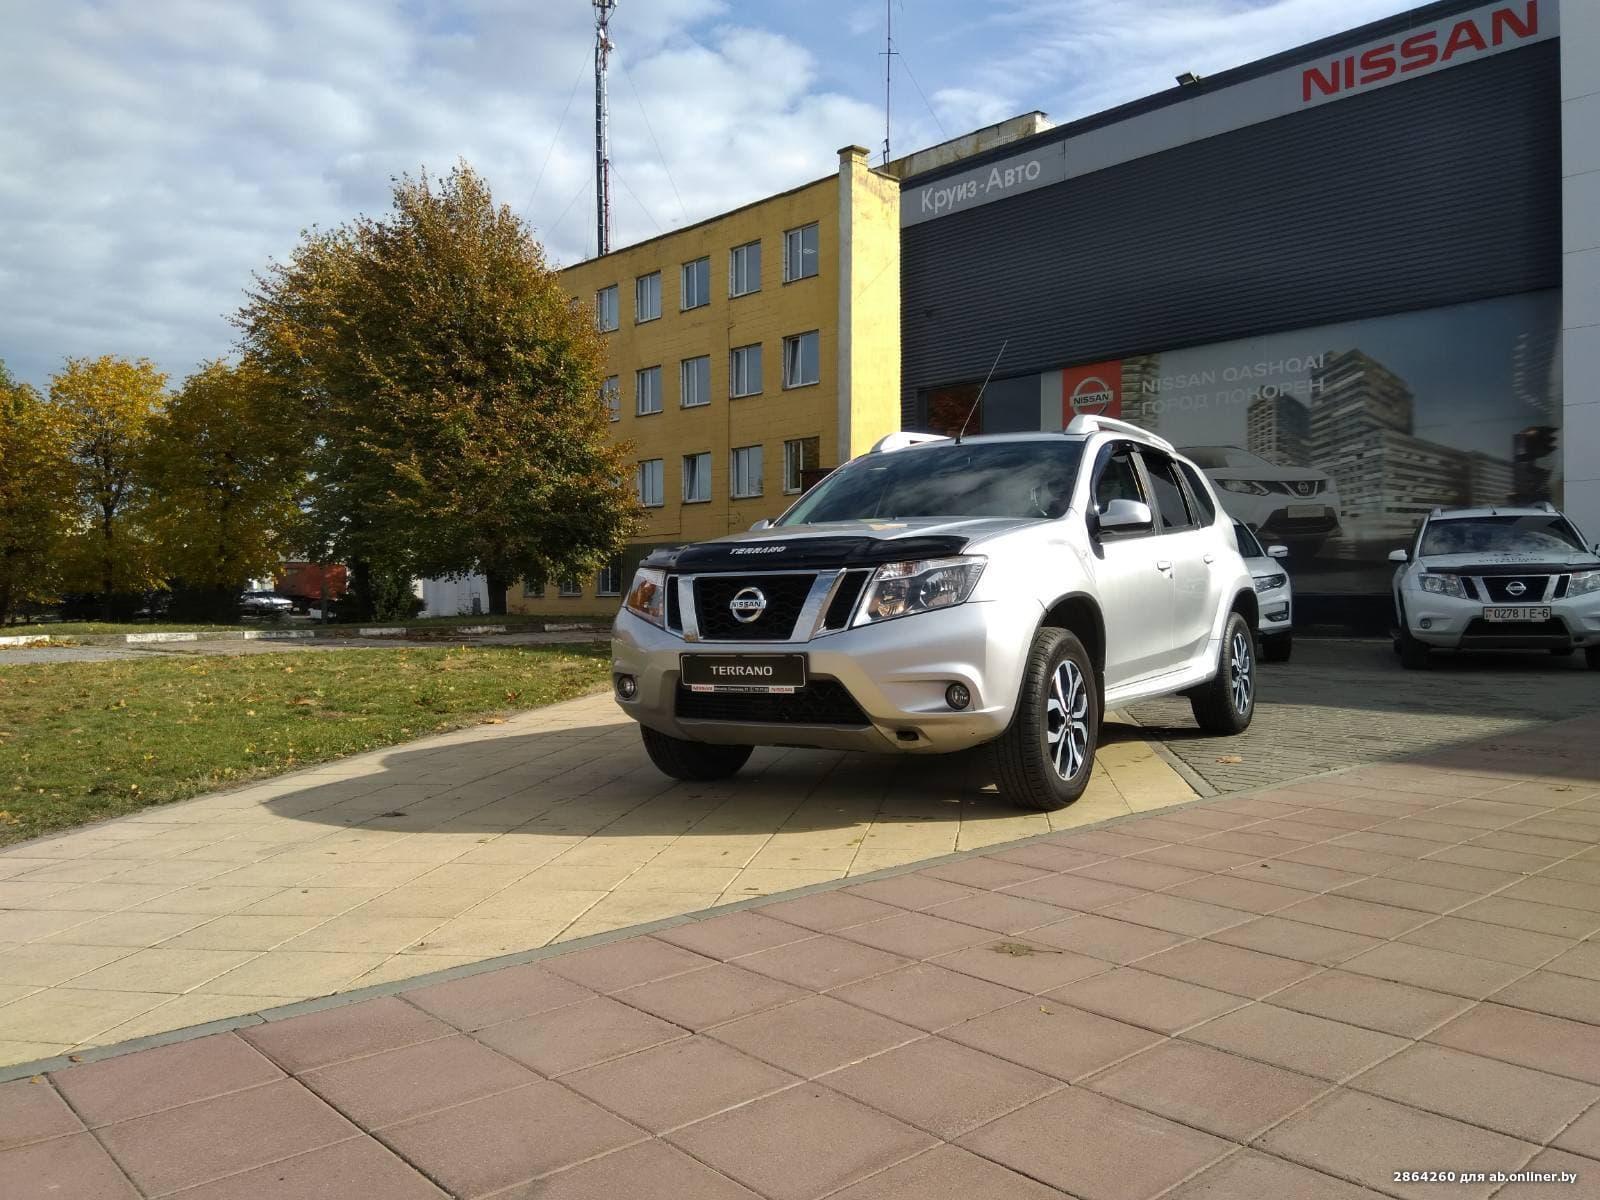 Nissan Terrano ELEGANCE PLUS